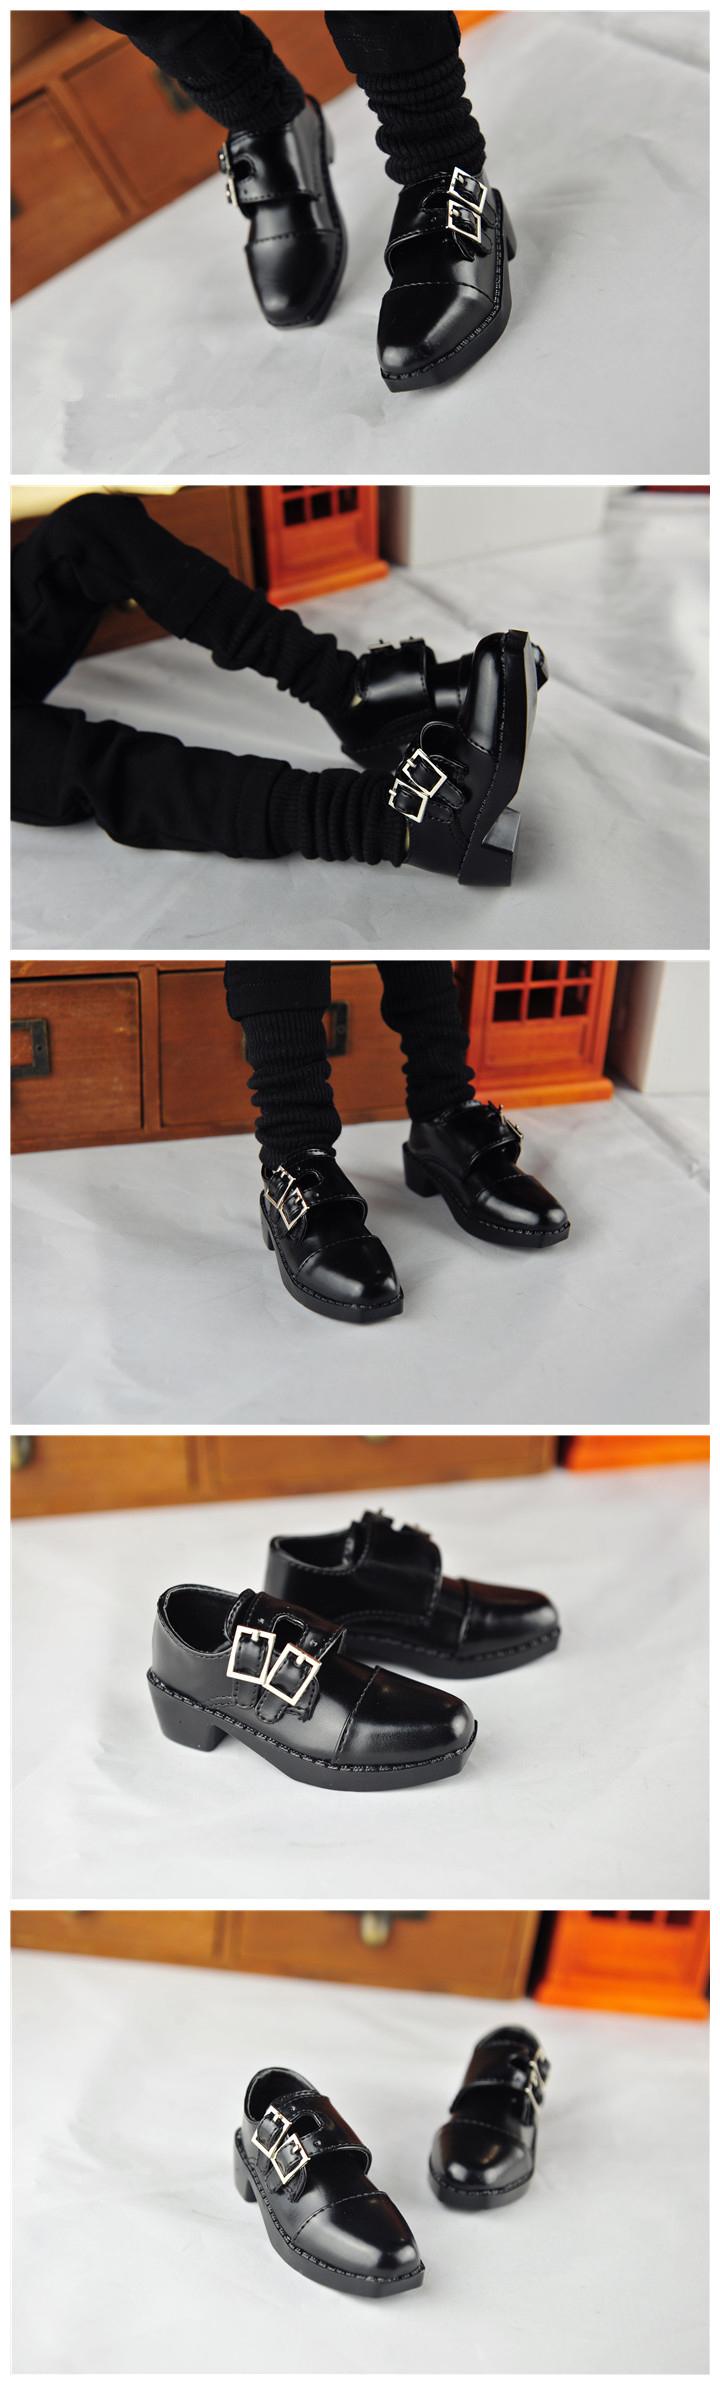 BJD靴  ドール靴 男用 人形靴 かわぐつ 1/3サイズ製品図4